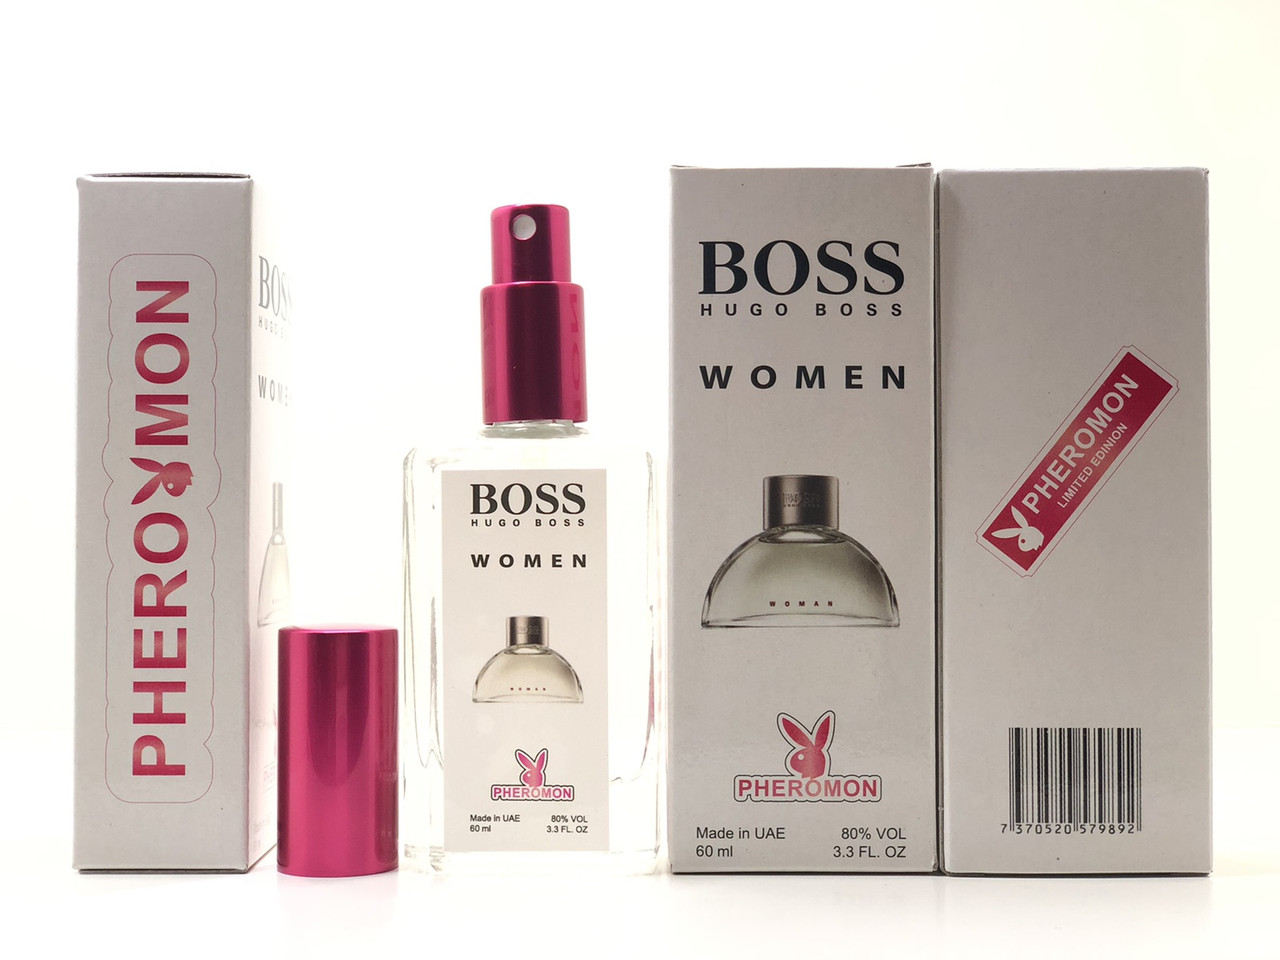 Женский аромат Hugo Boss Boss Woman (Хуго Босс Босс Вумен) с феромонами 60 мл